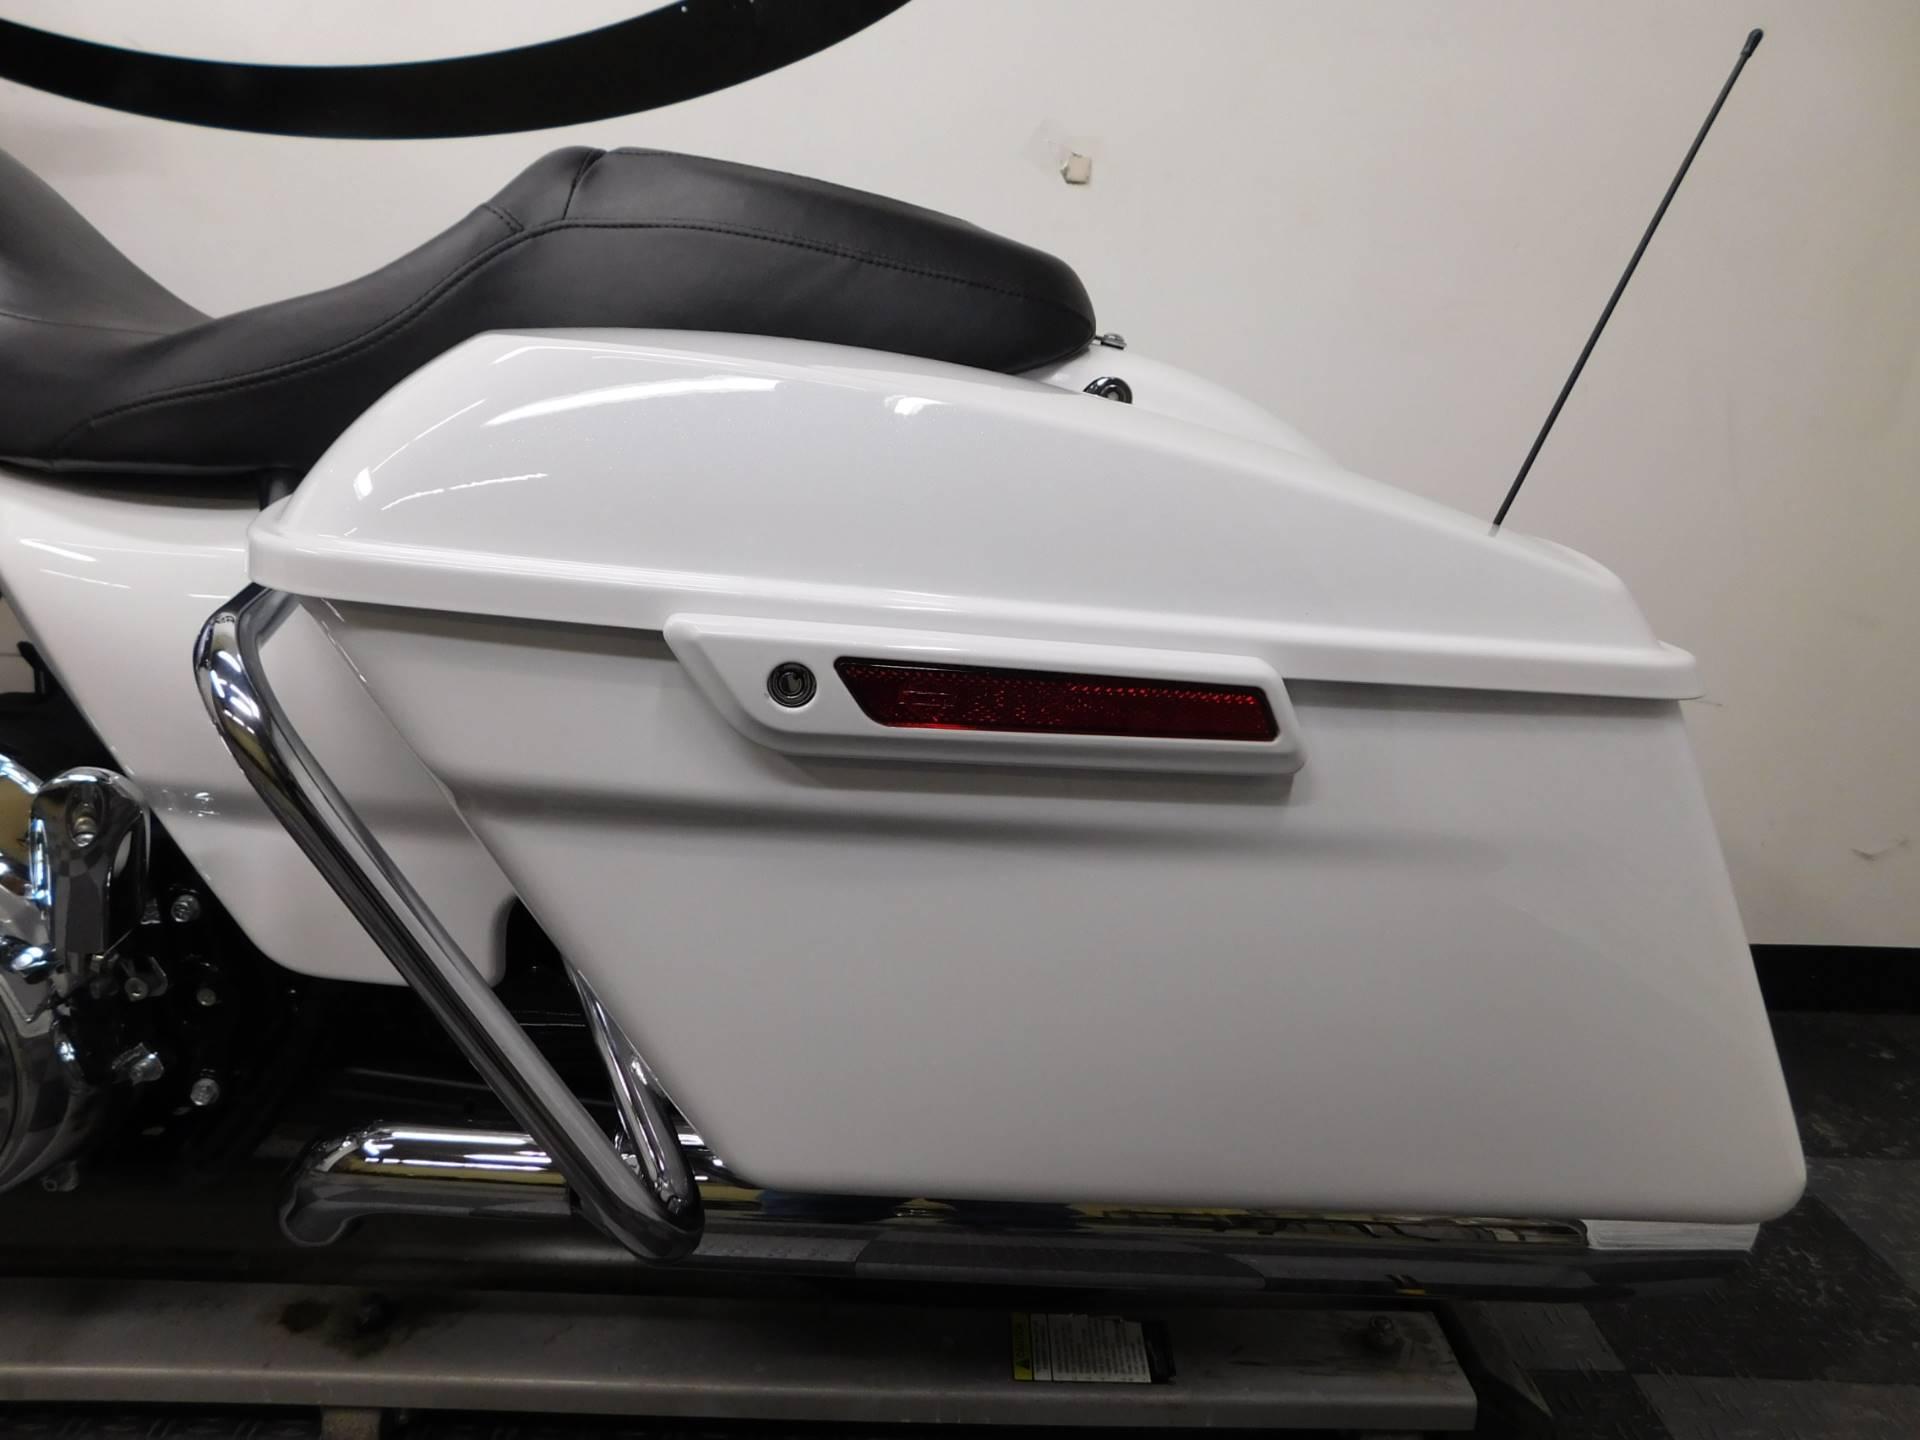 2017 Harley-Davidson Street Glide Special 11